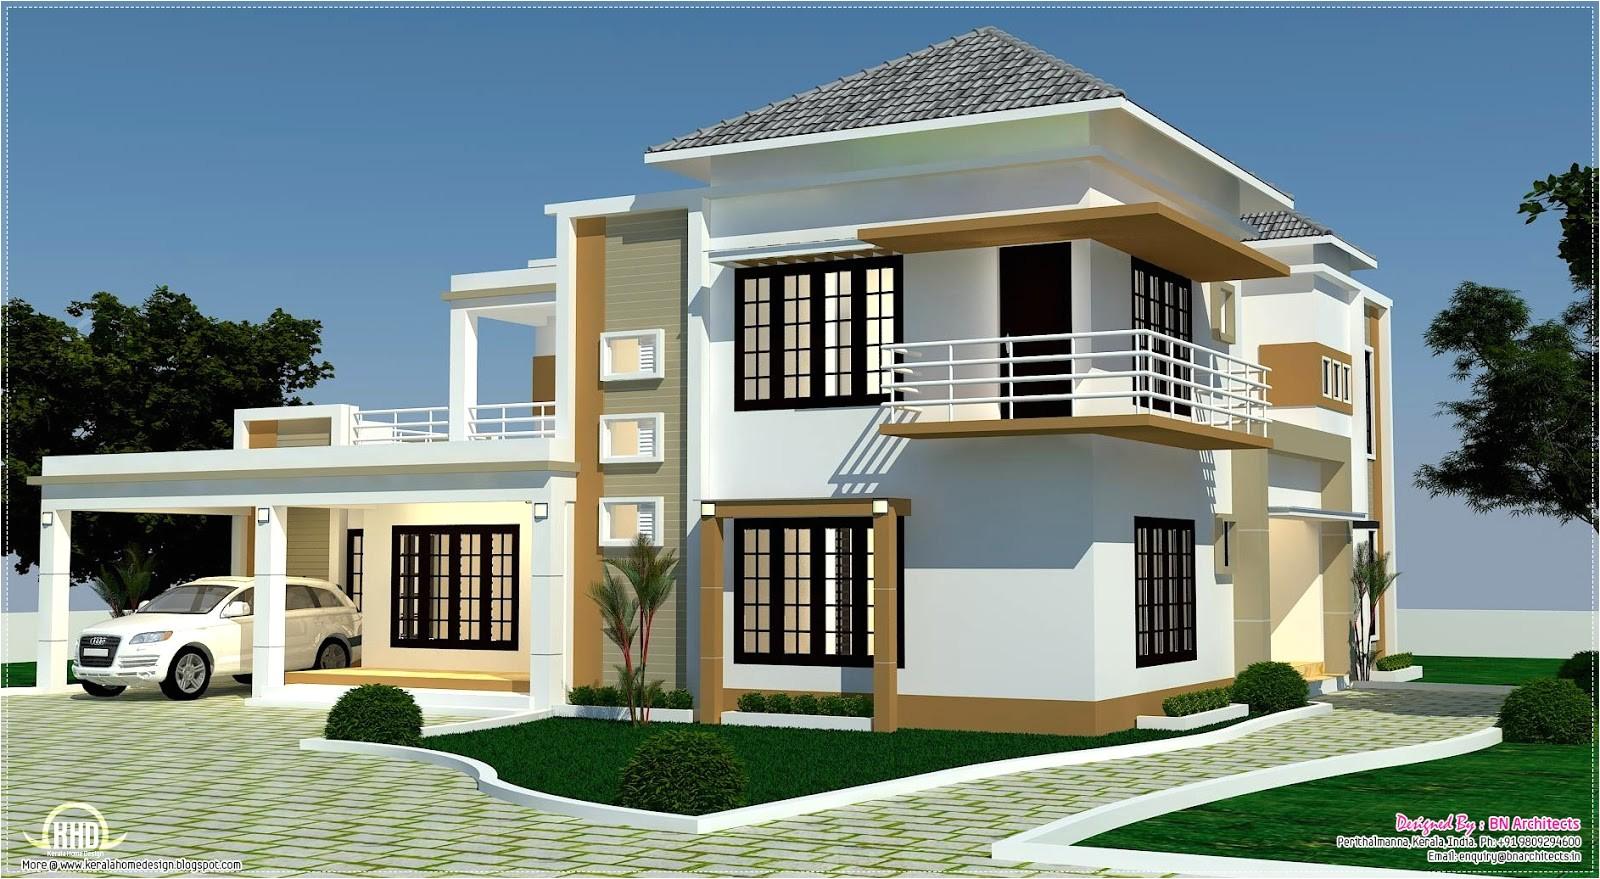 Home Plan 3d View Floor Plan 3d Views and Interiors Of 4 Bedroom Villa